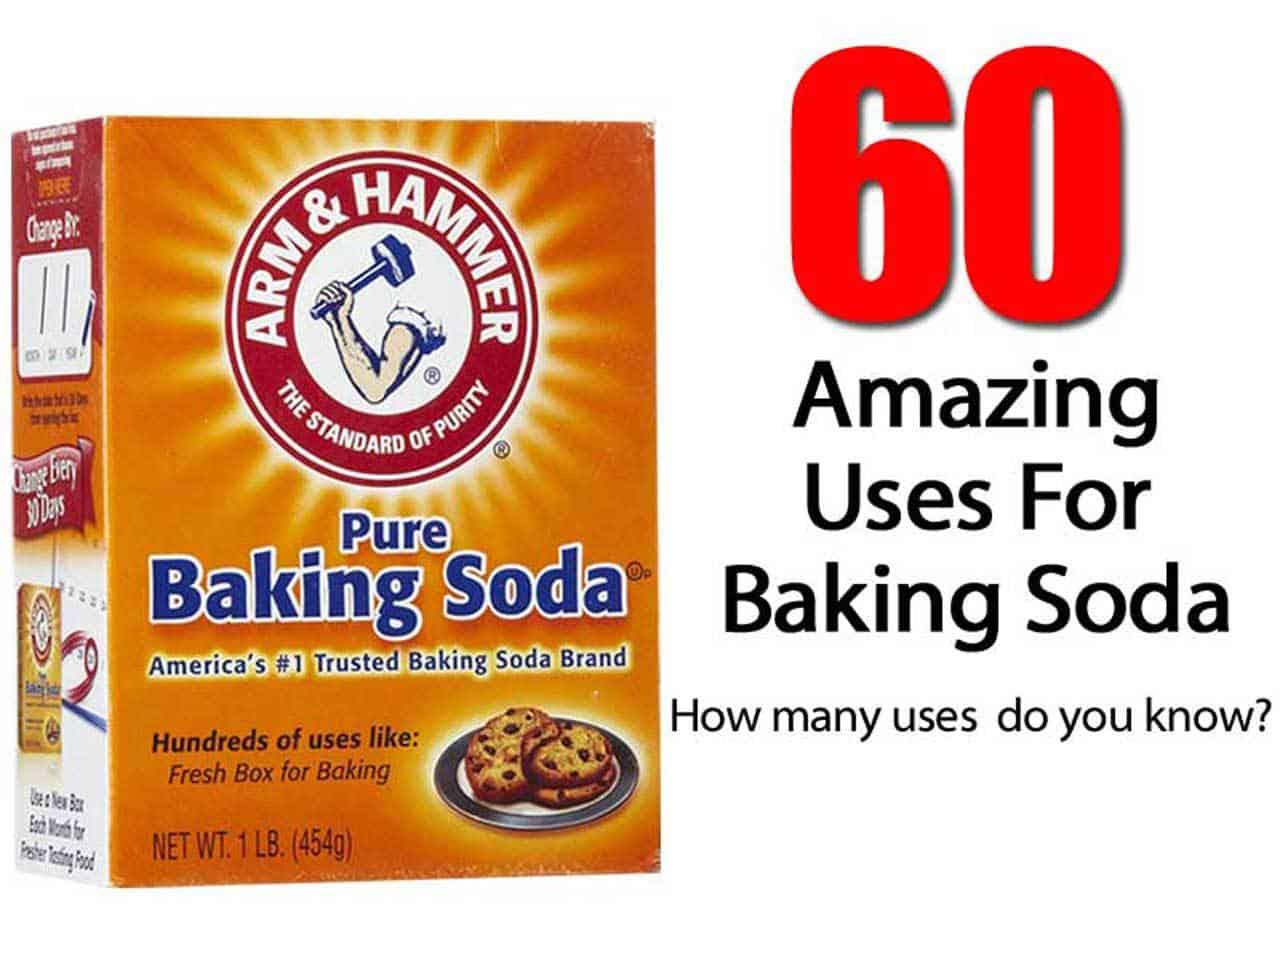 can i put baking soda in the washing machine